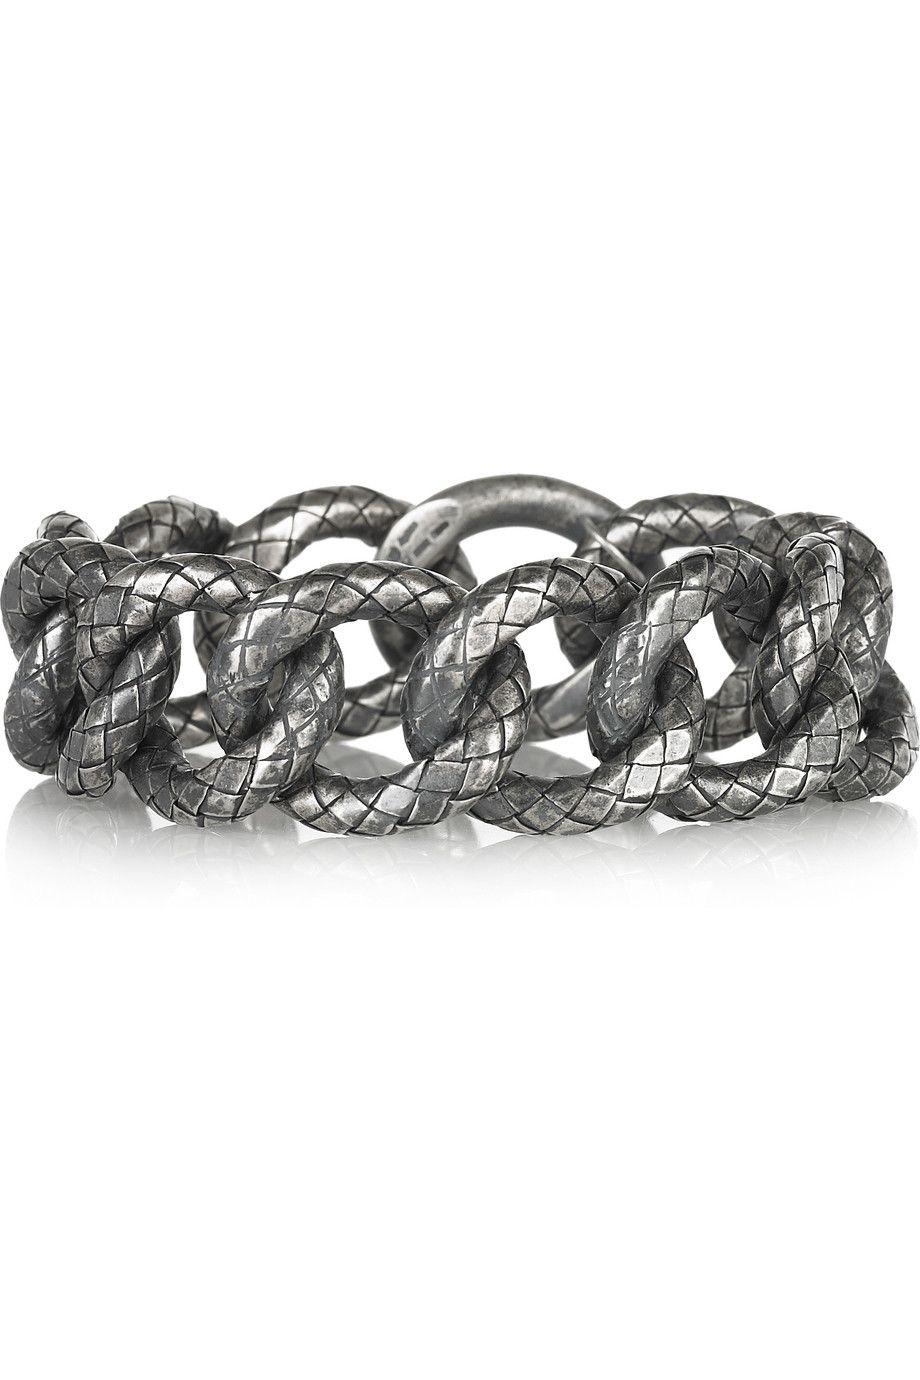 Bottega Veneta|Intrecciato oxidized-silver chain bracelet. Shop the Tough Luxe issue of The Edit magazine.